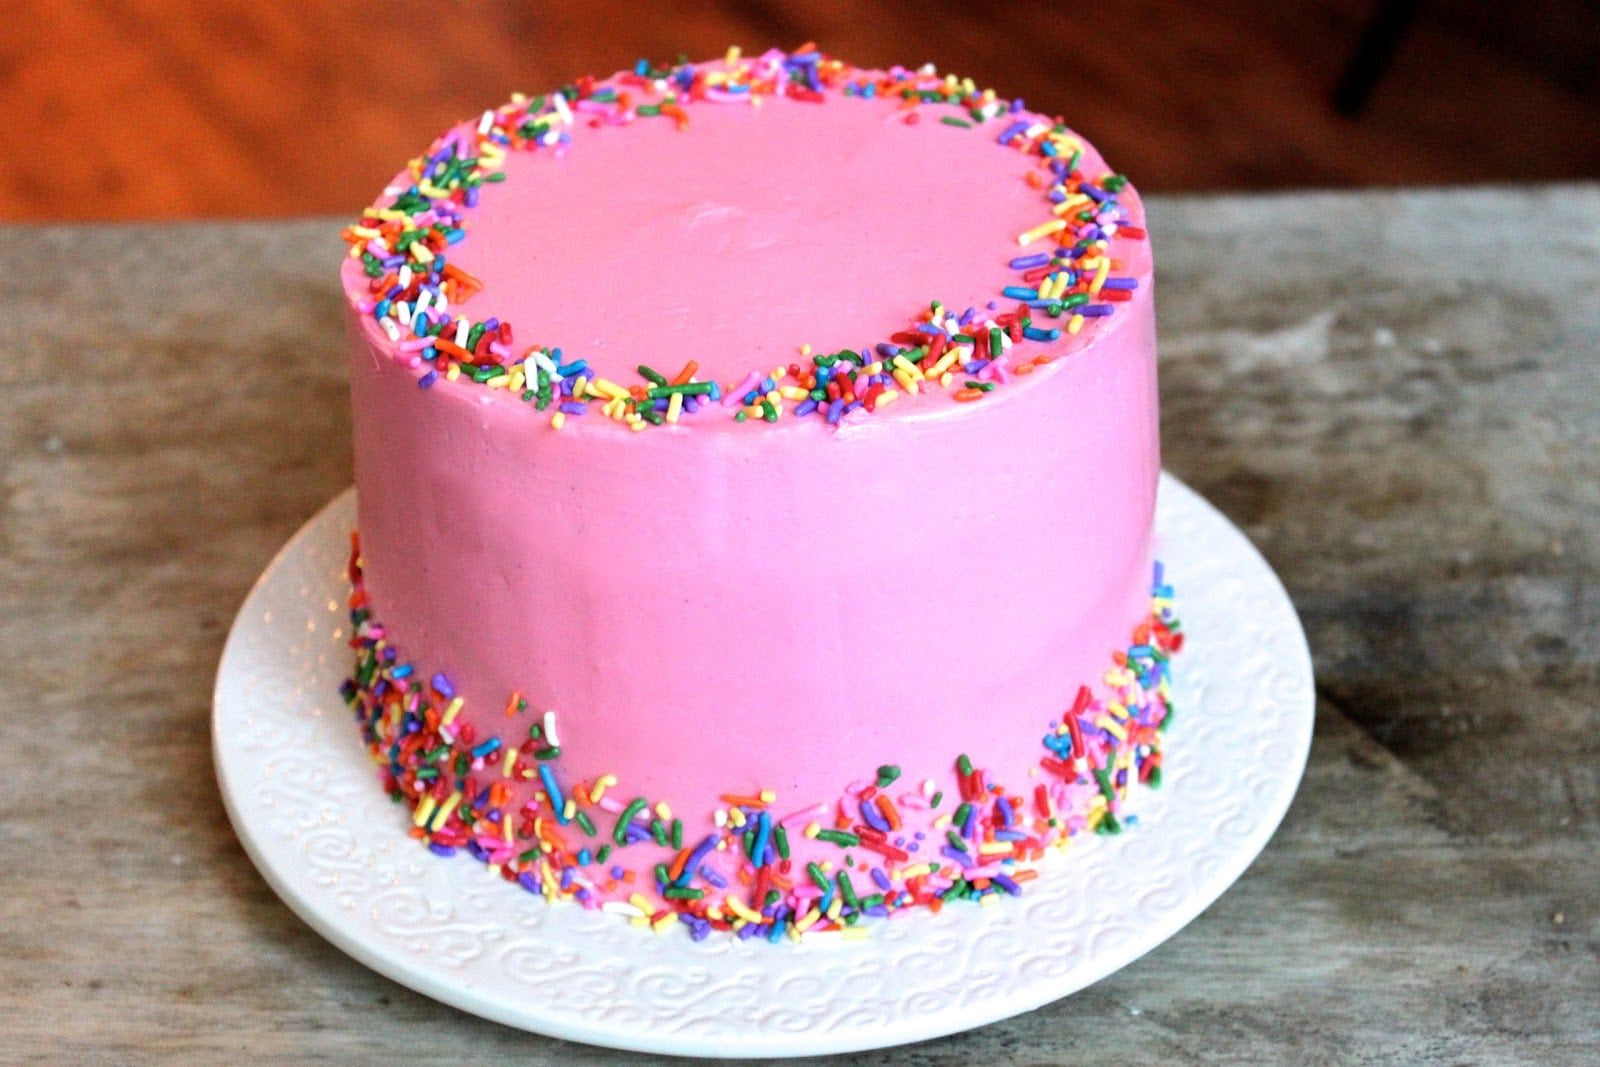 Pink Vanilla Bean Celebration Cake The Little Epicurean